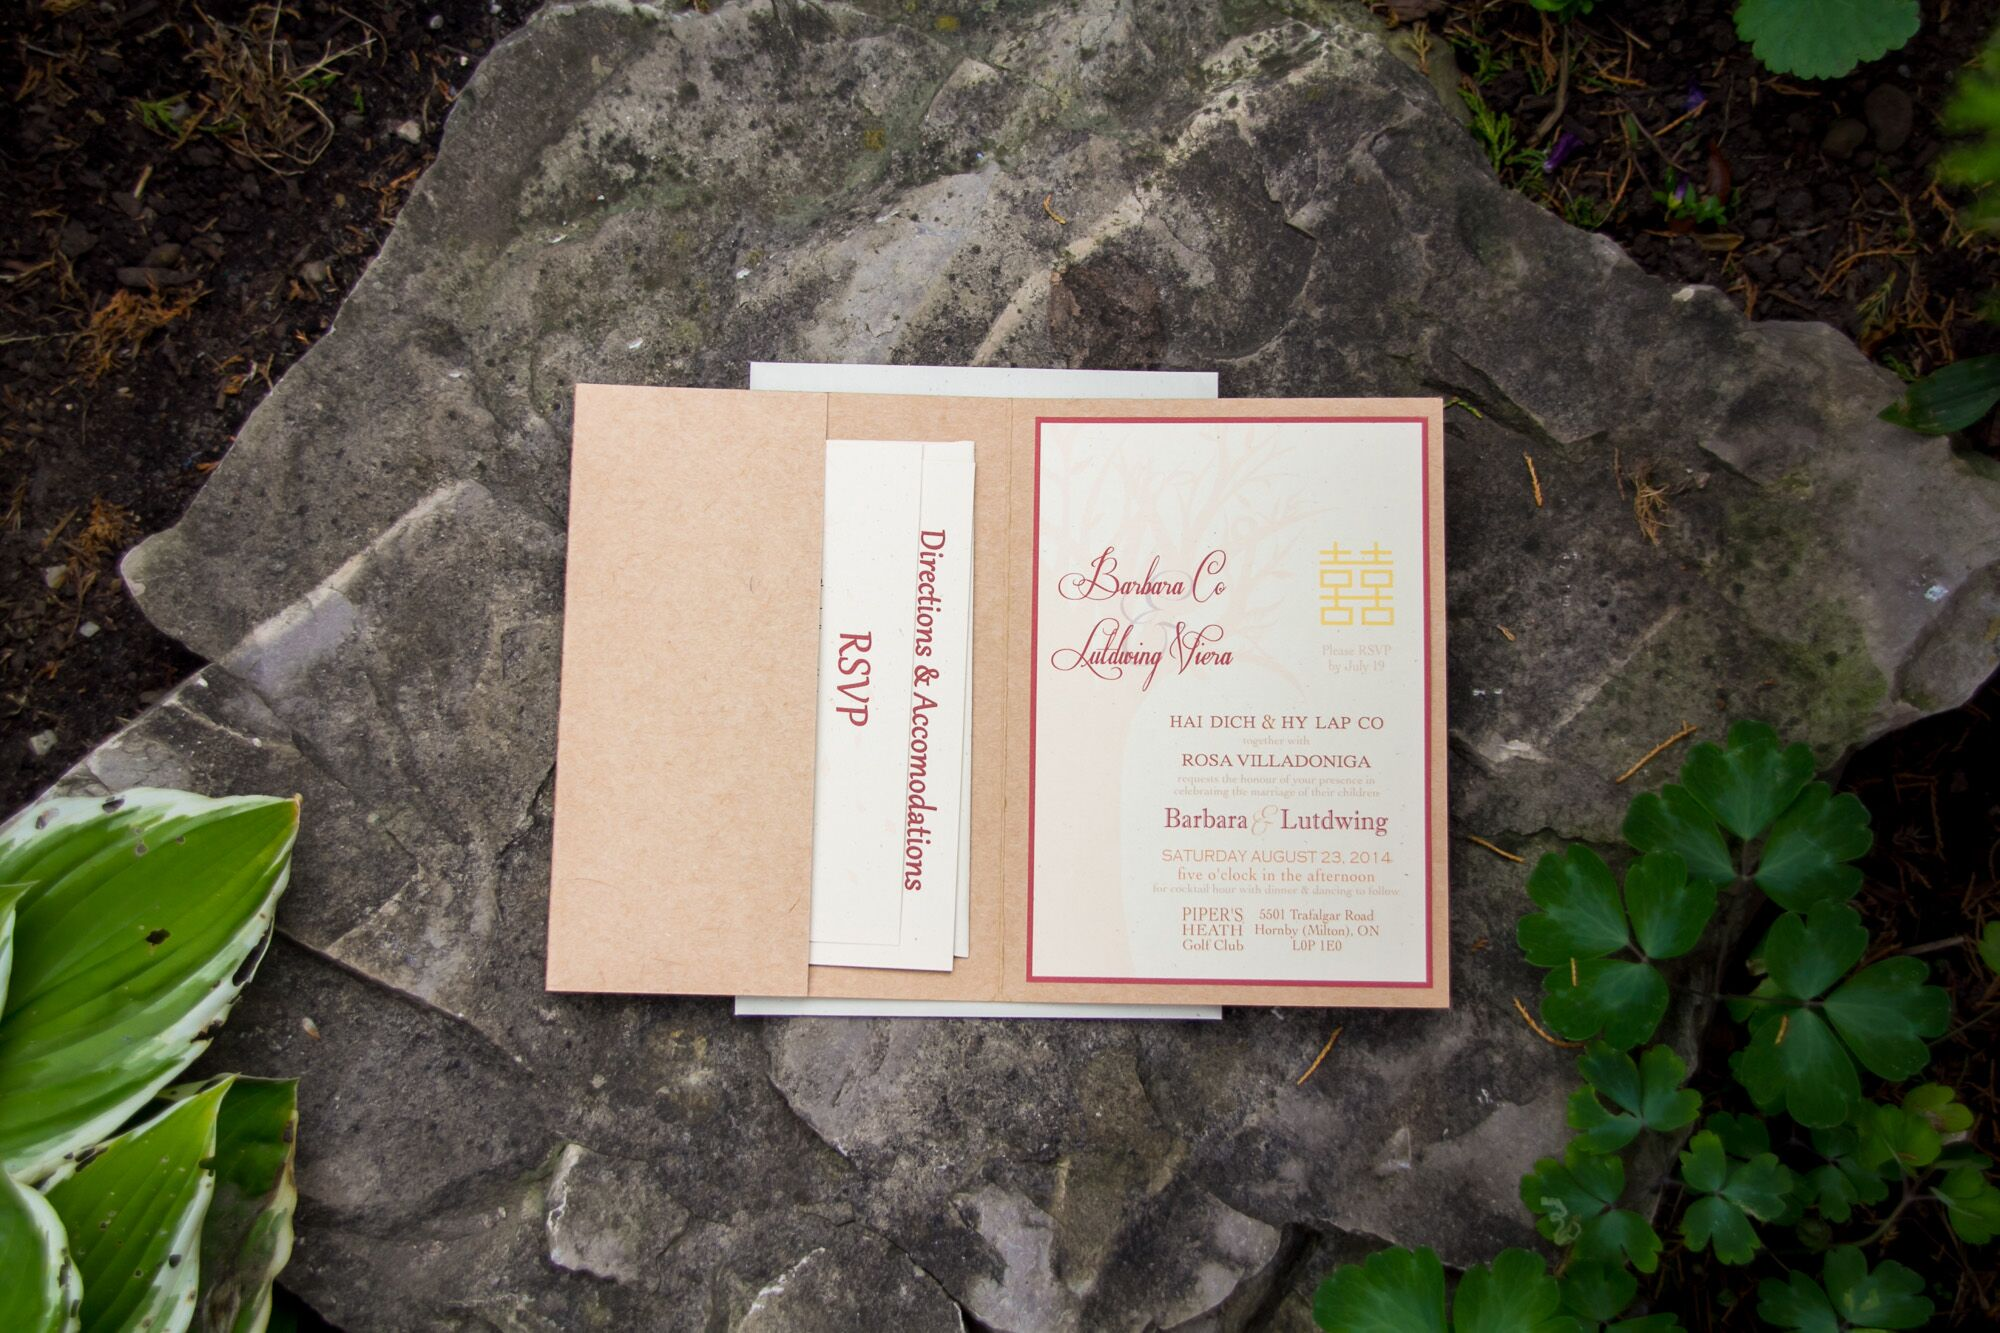 Diy Paper Wedding Invitation: DIY Recycled Paper Wedding Invitations